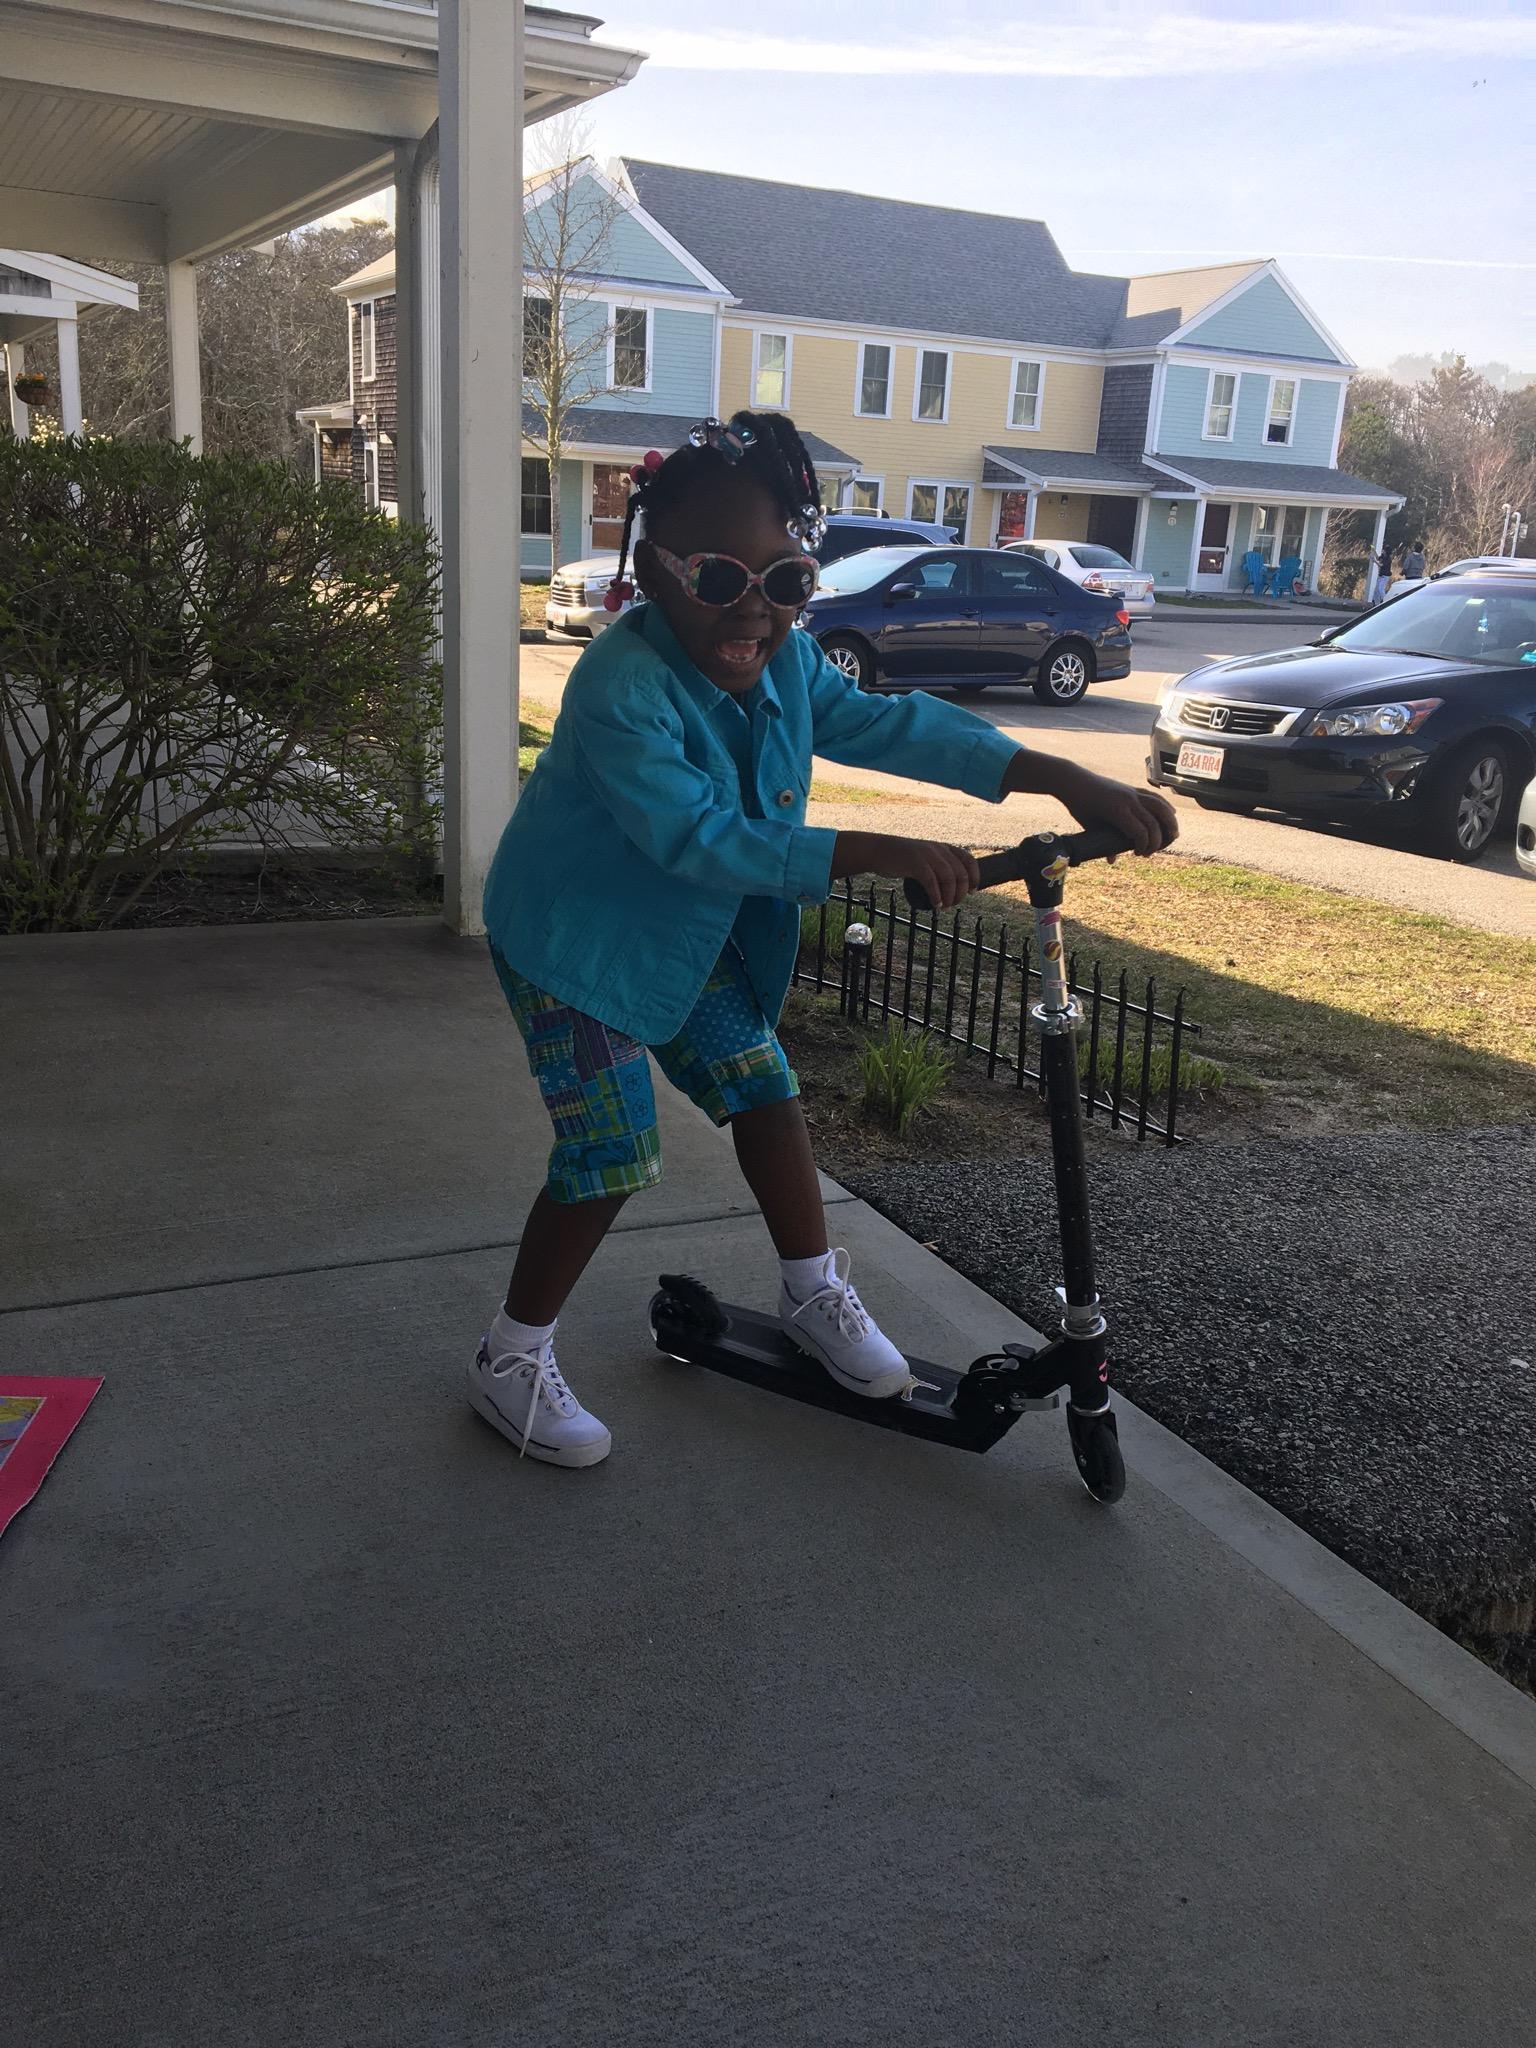 Scootin